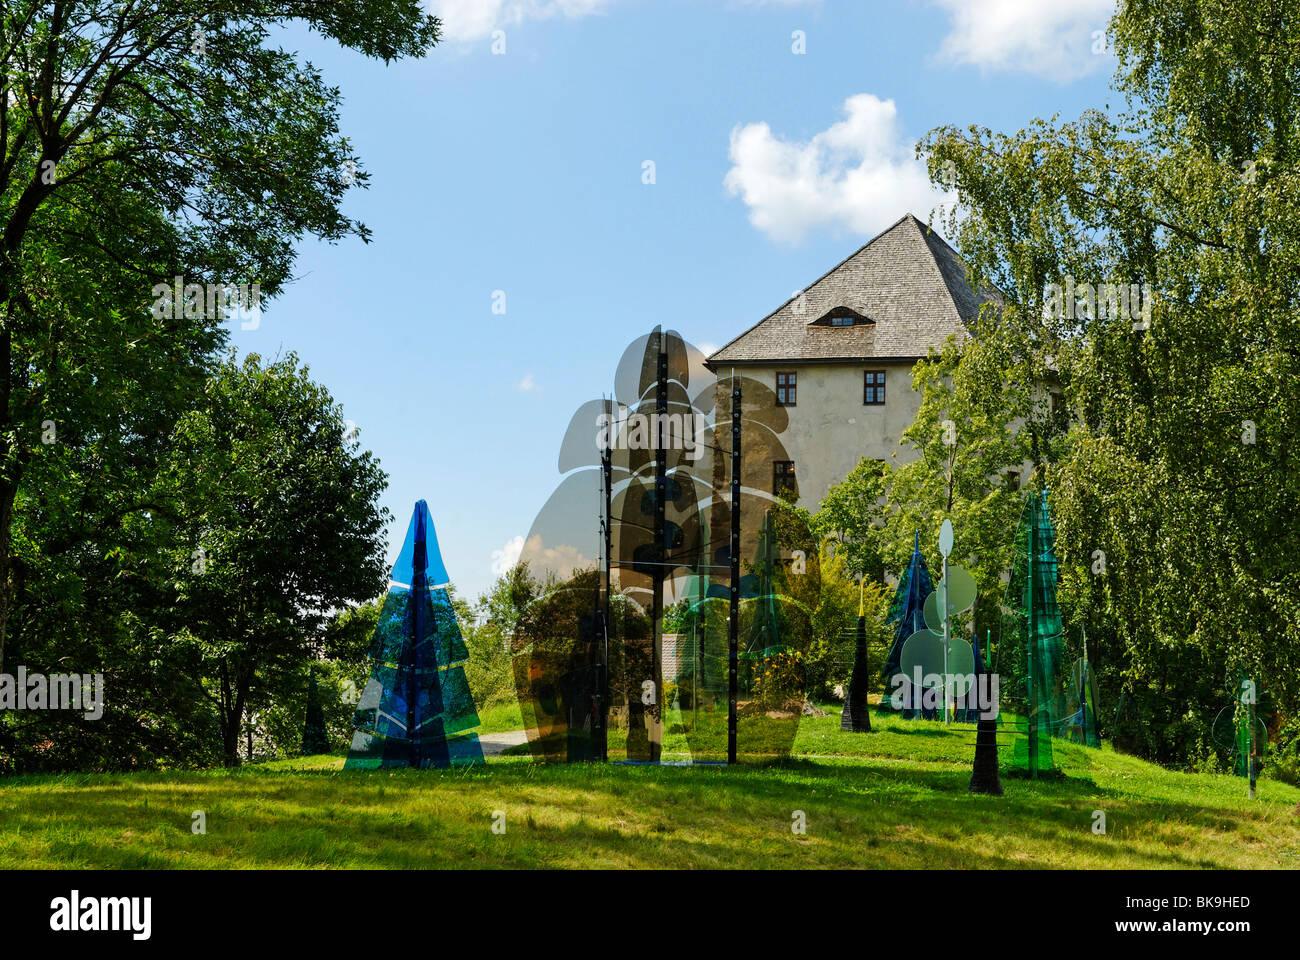 Glass forest in front of the Weissenstein ruins near Regen, Bavarian Forest, Lower Bavaria, Bavaria, Germany, Europe Stock Photo